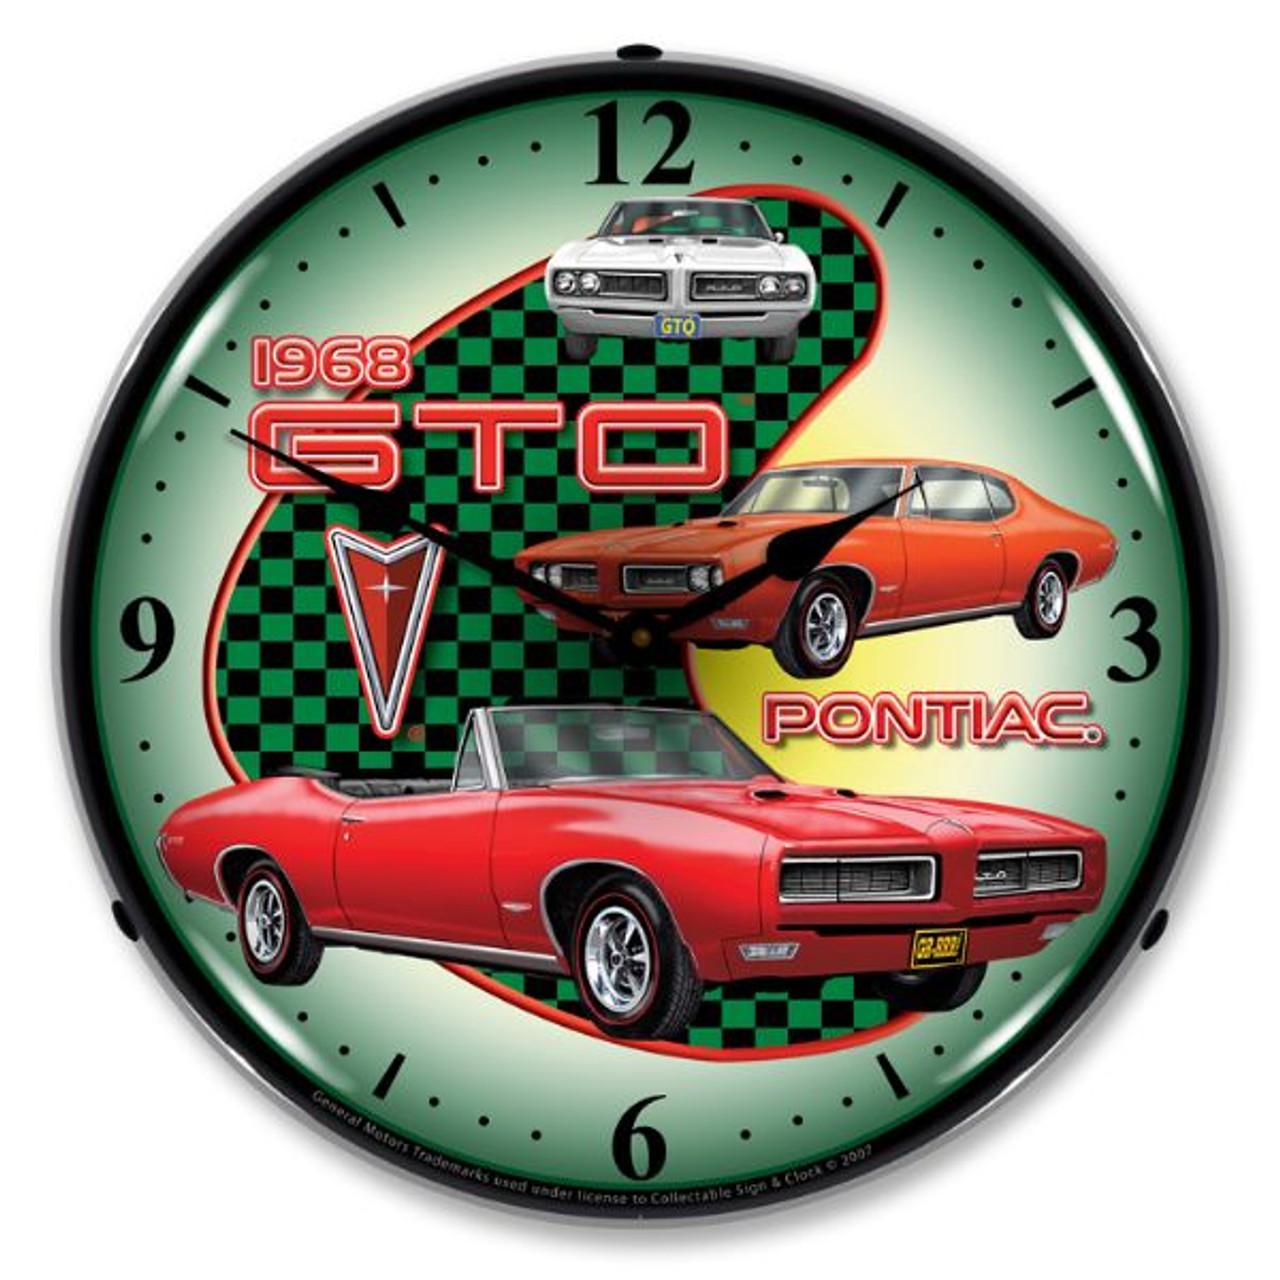 1968 Pontiac GTO Lighted Wall Clock